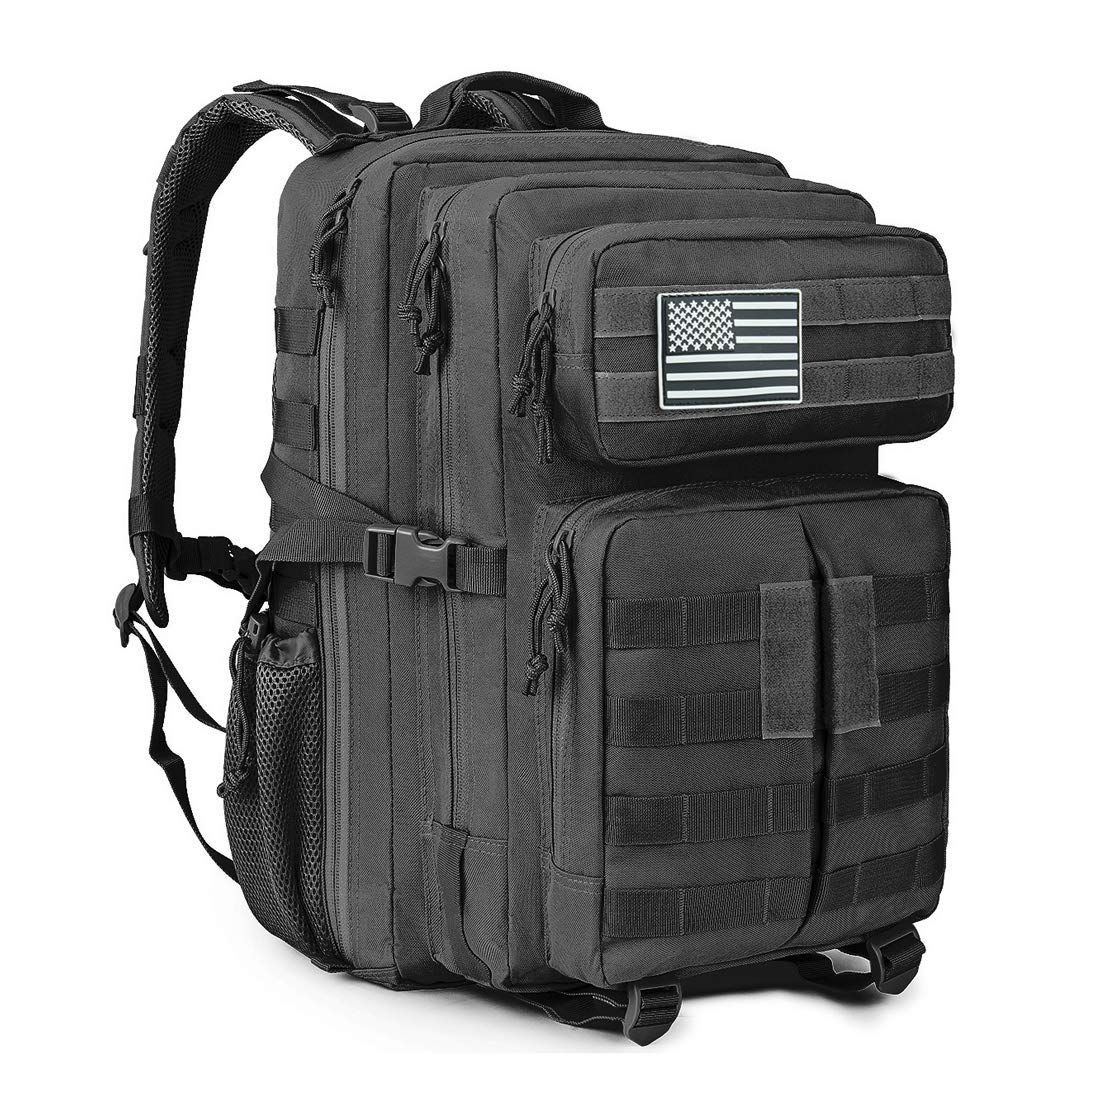 MEWAY Military Tactical Backpack (Black)